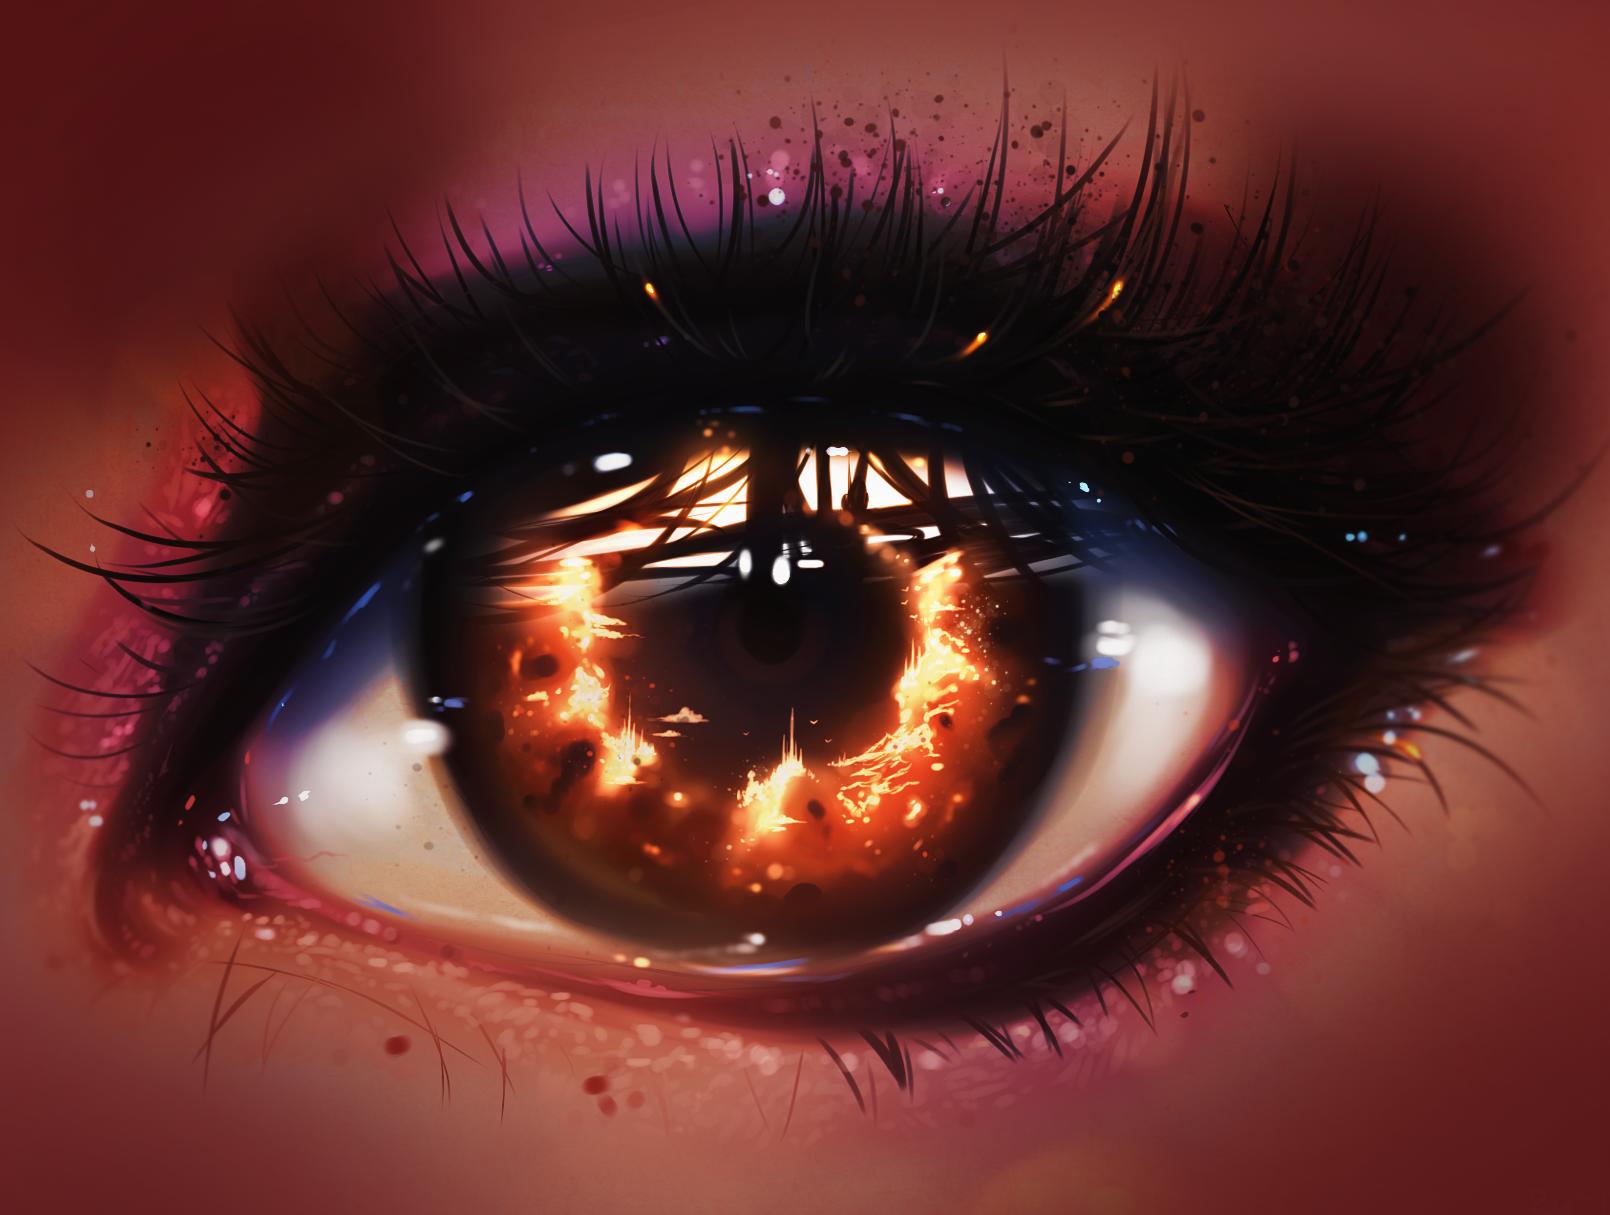 Картинки глаз для авы